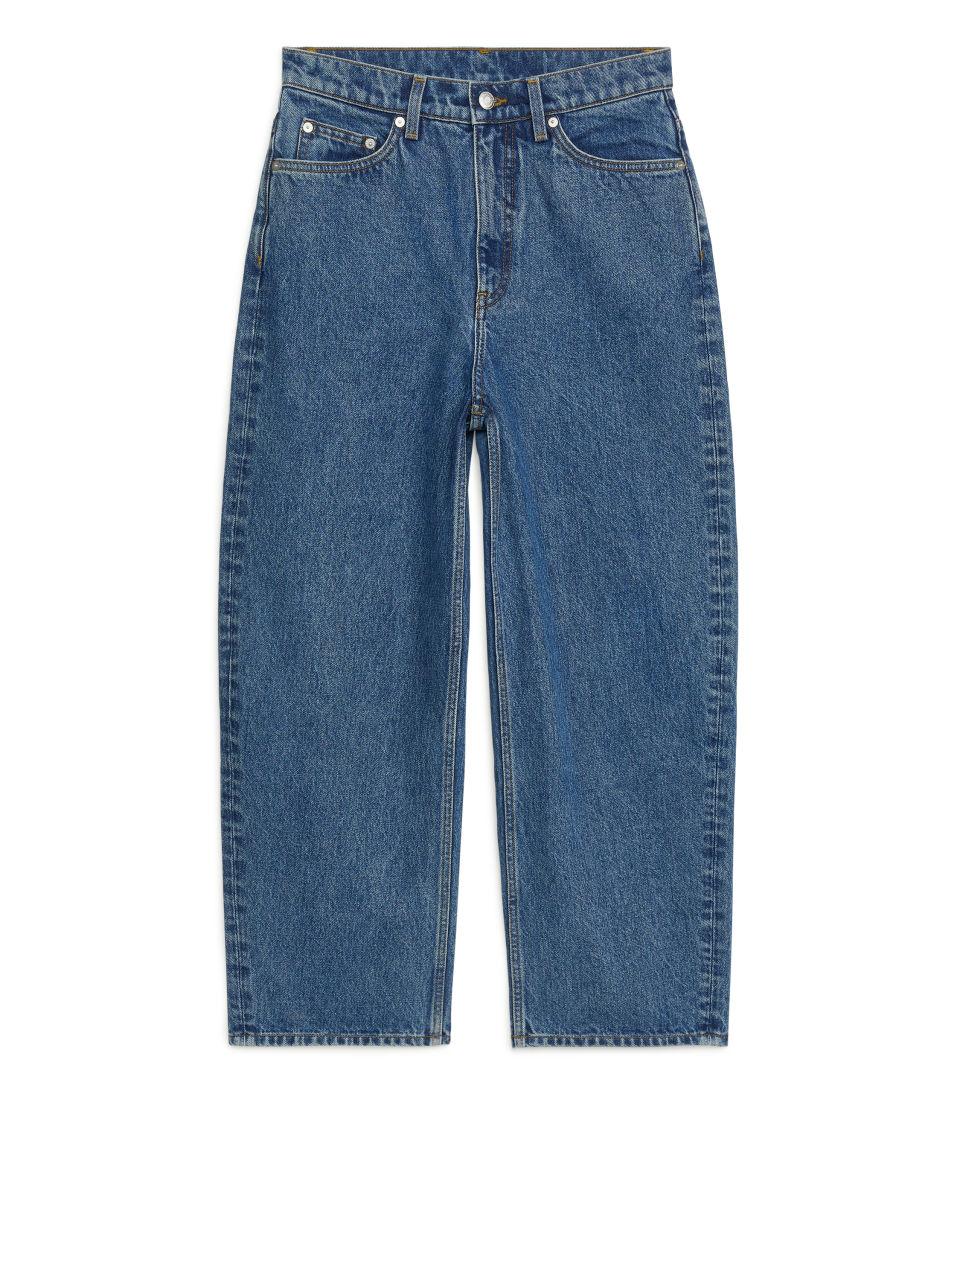 LOOSE Cropped Barrel Leg Jeans - Blue